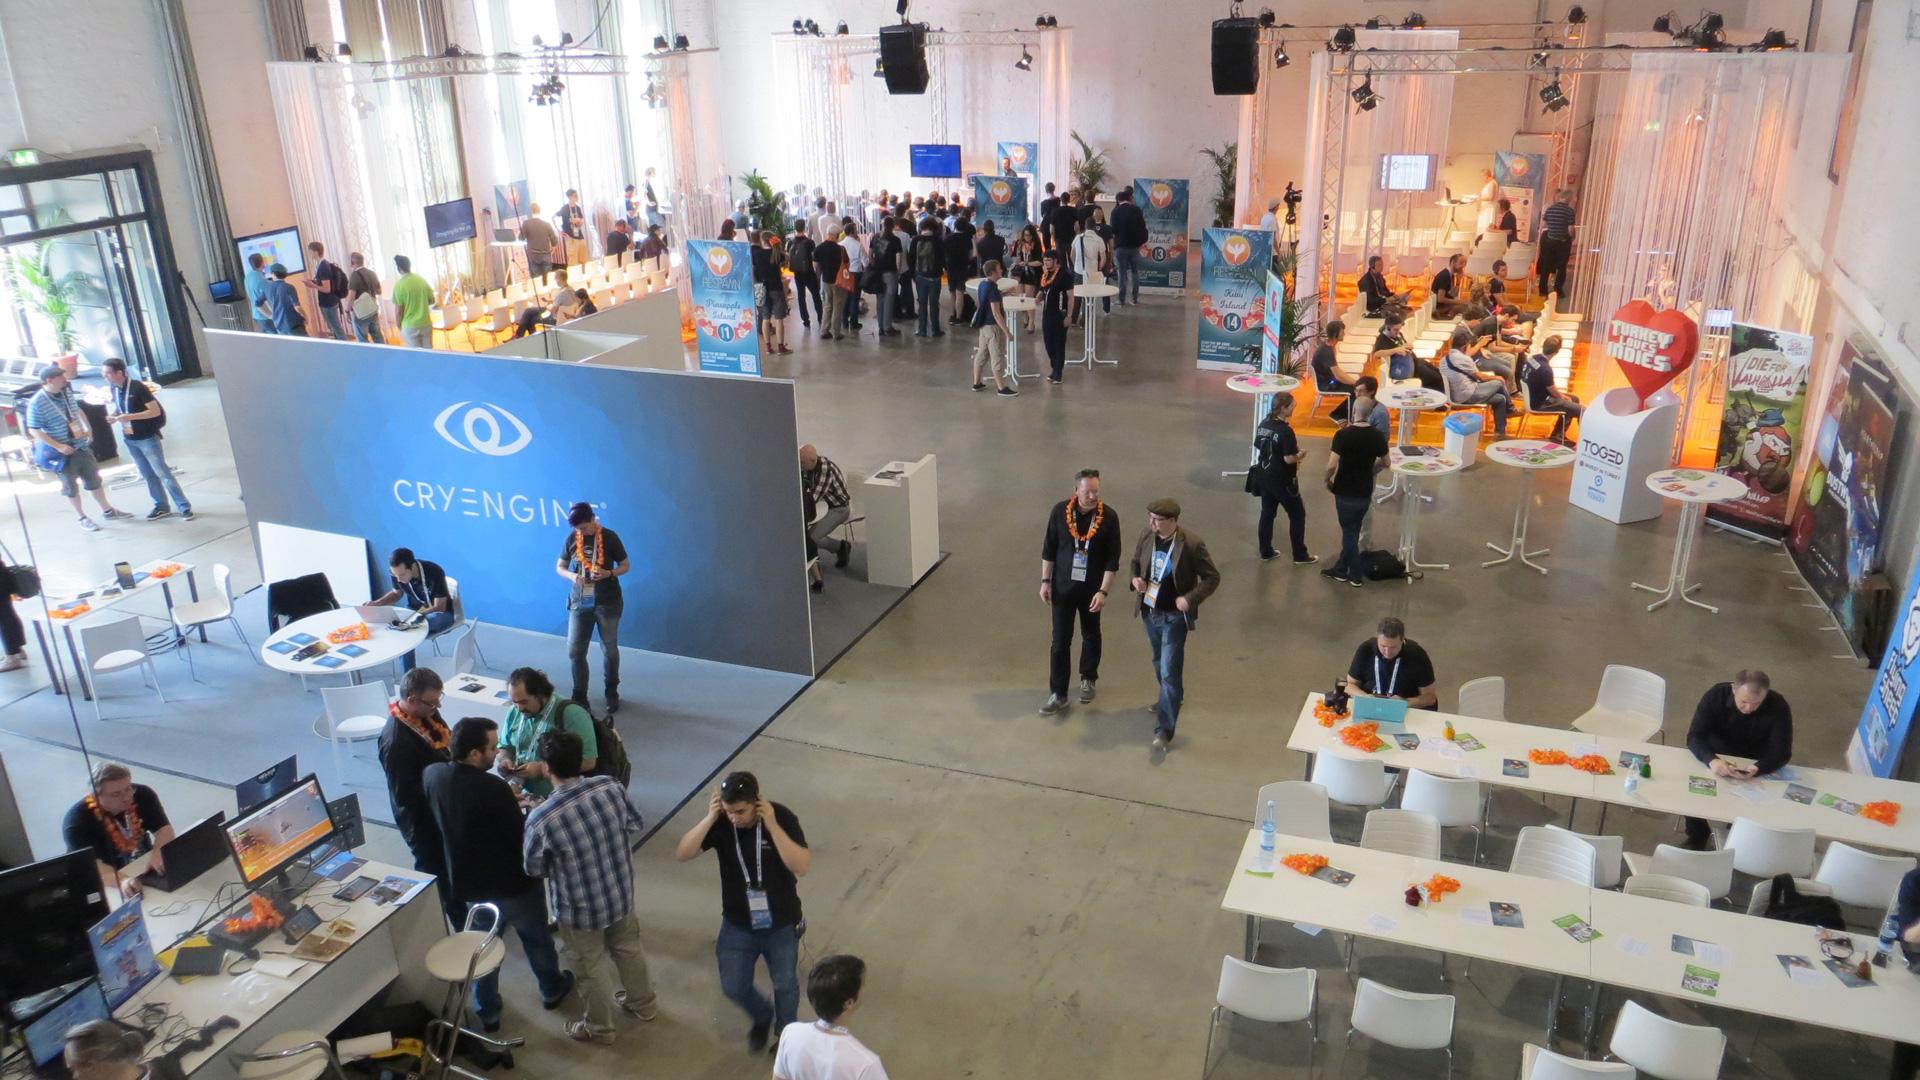 Virtual Reality trifft auf Retrogames– Trends auf der Gamescom 2016